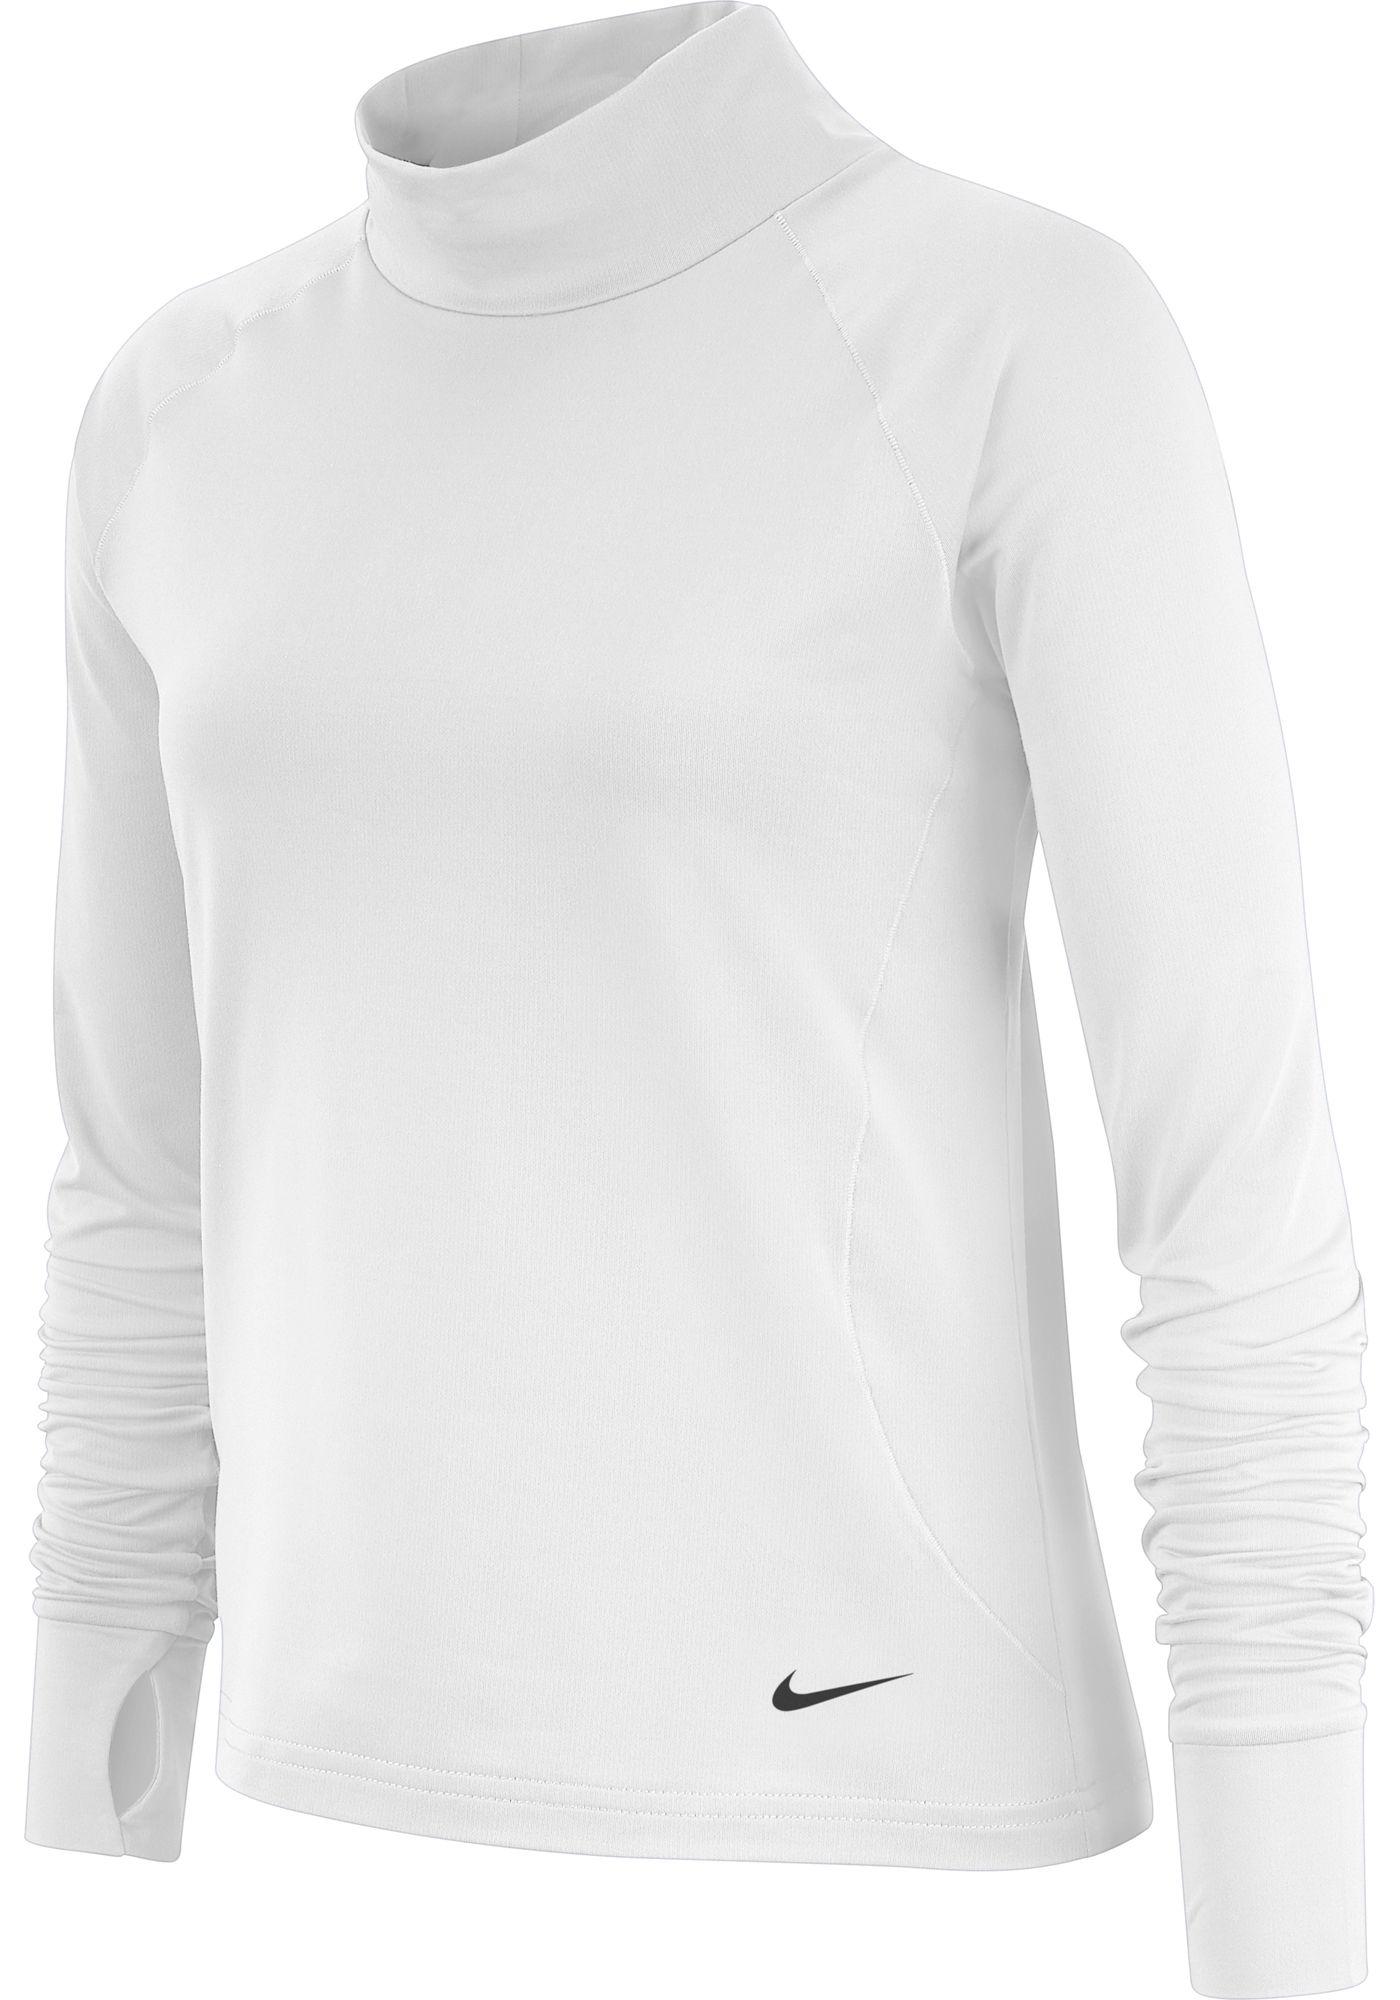 Nike Girls' Pro Warm Long Sleeve Shirt